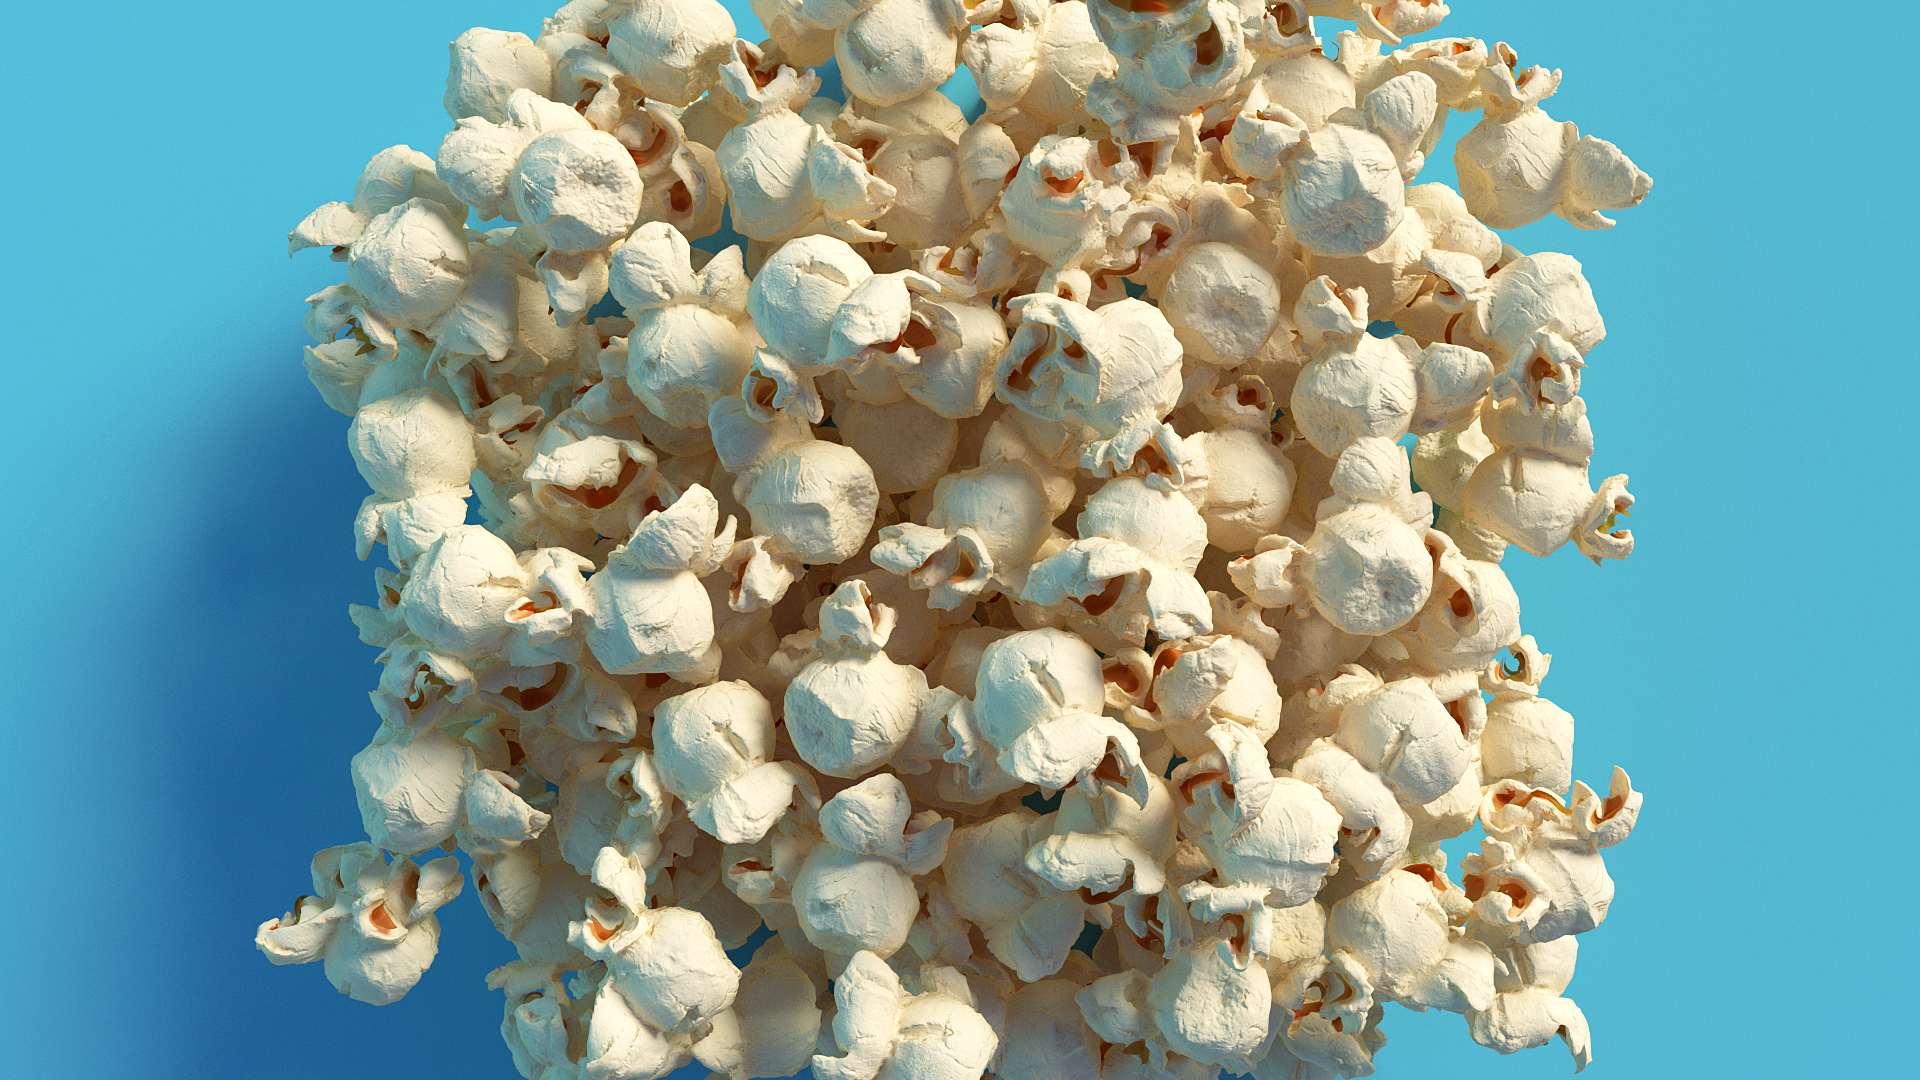 popcorn_RS_02_0012-0-00-00-00.jpg